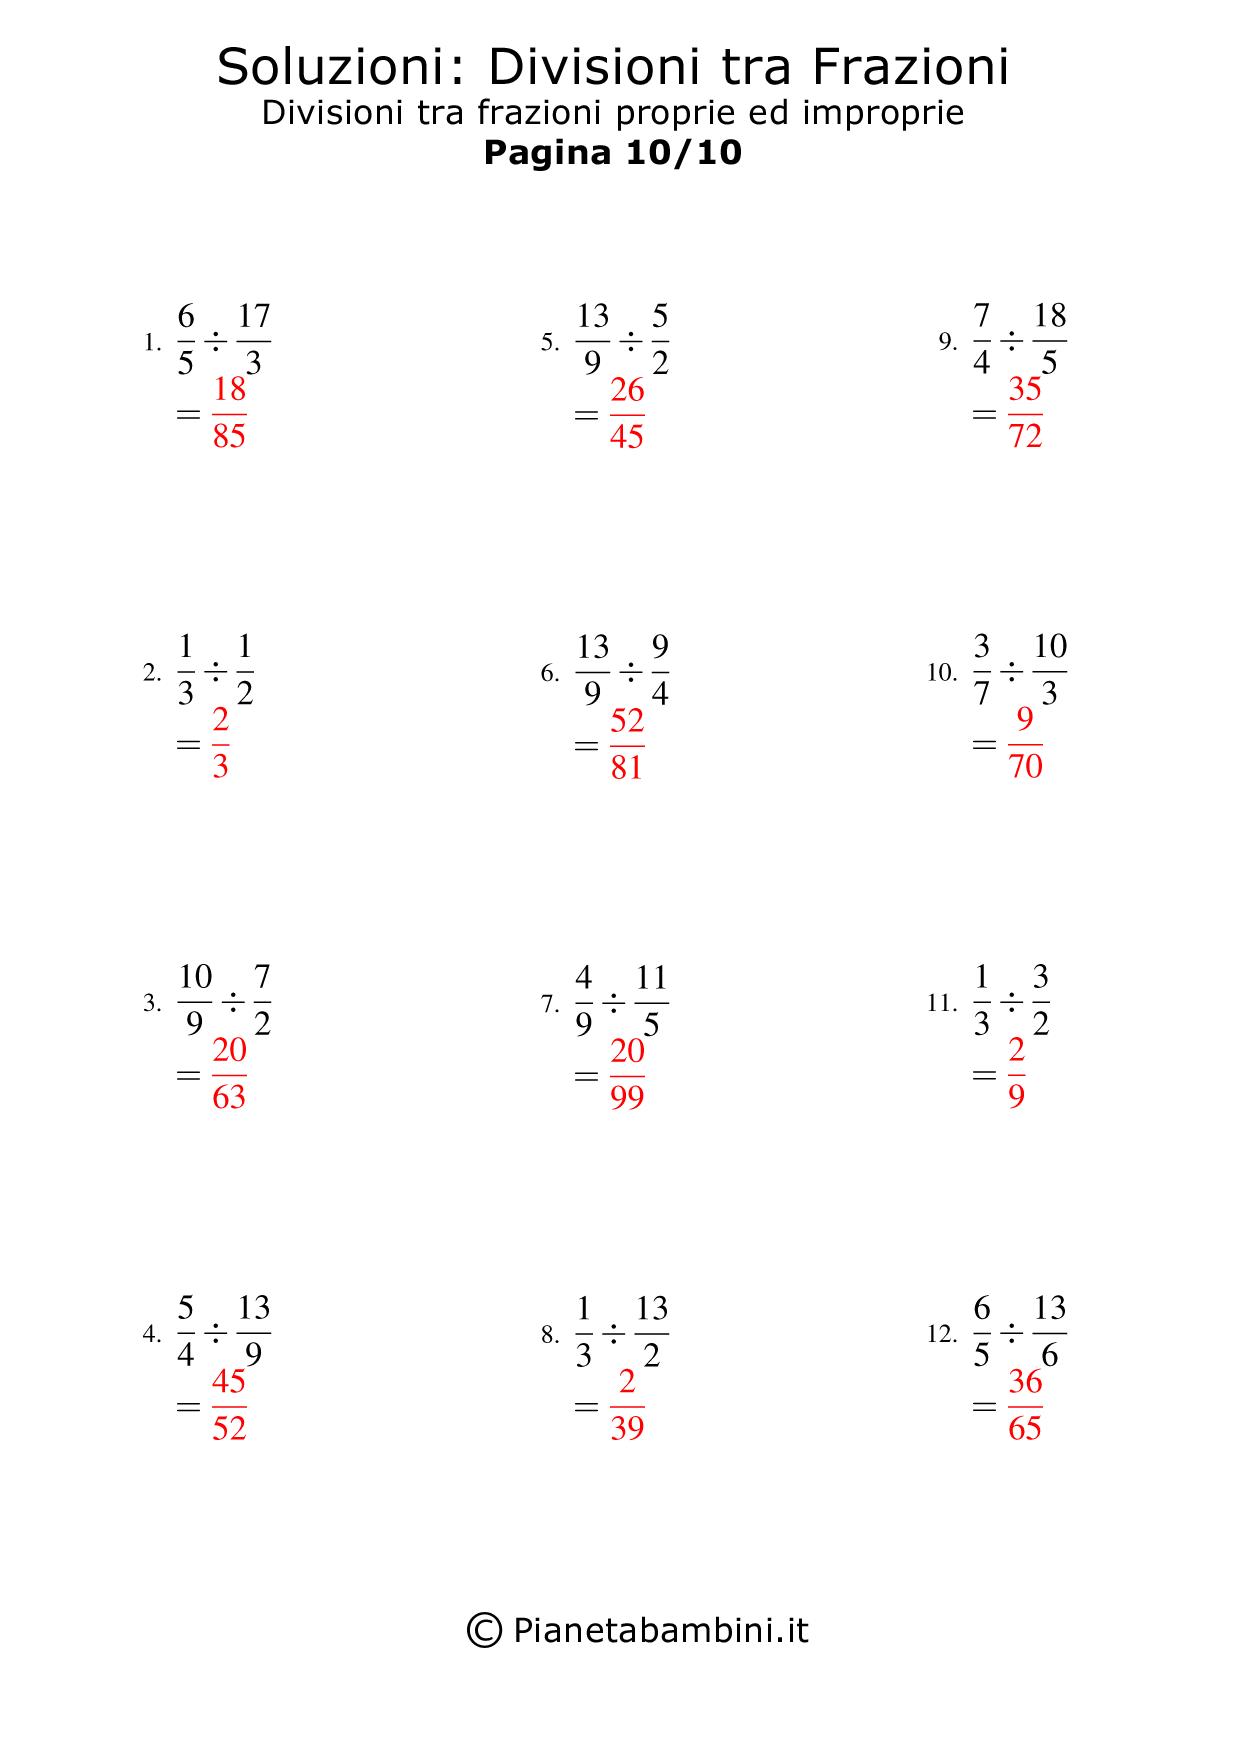 Soluzioni-Divisioni-Frazioni-Proprie-Improprie_10